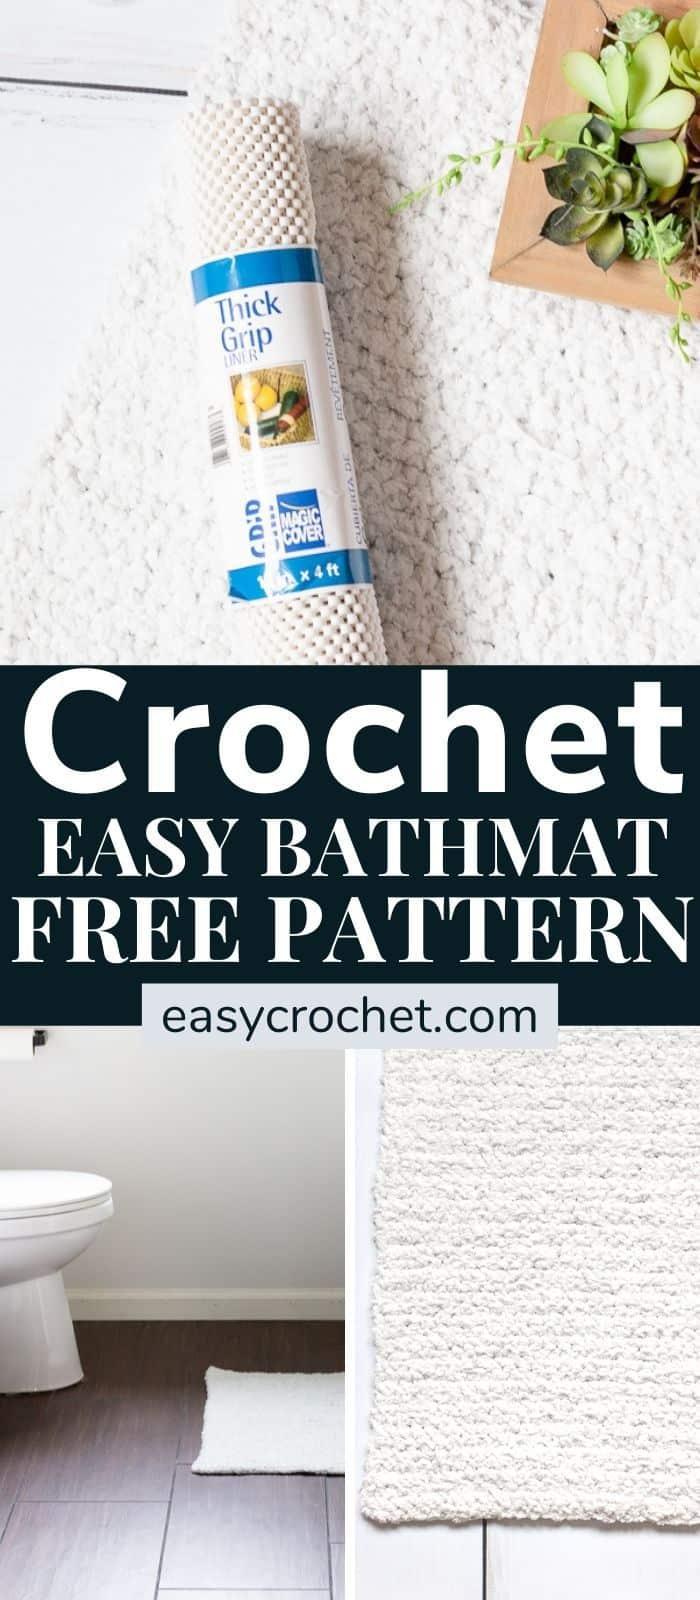 Easy Crochet Bath Mat Pattern via @easycrochetcom